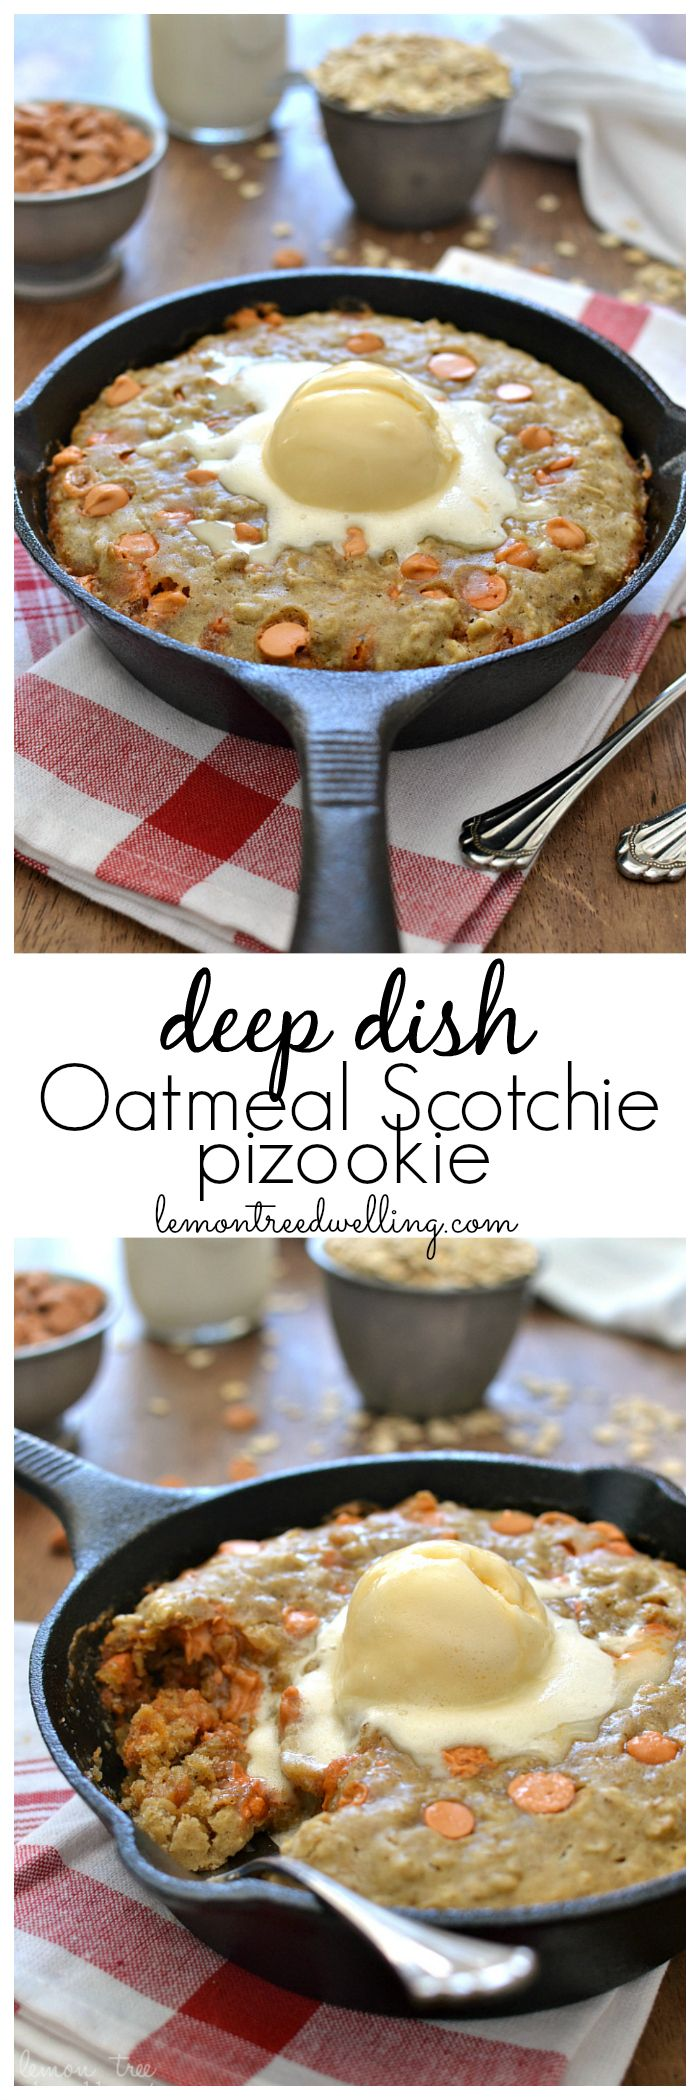 Deep Dish Oatmeal Scotchie Pizookie   Lemon Tree Dwelling